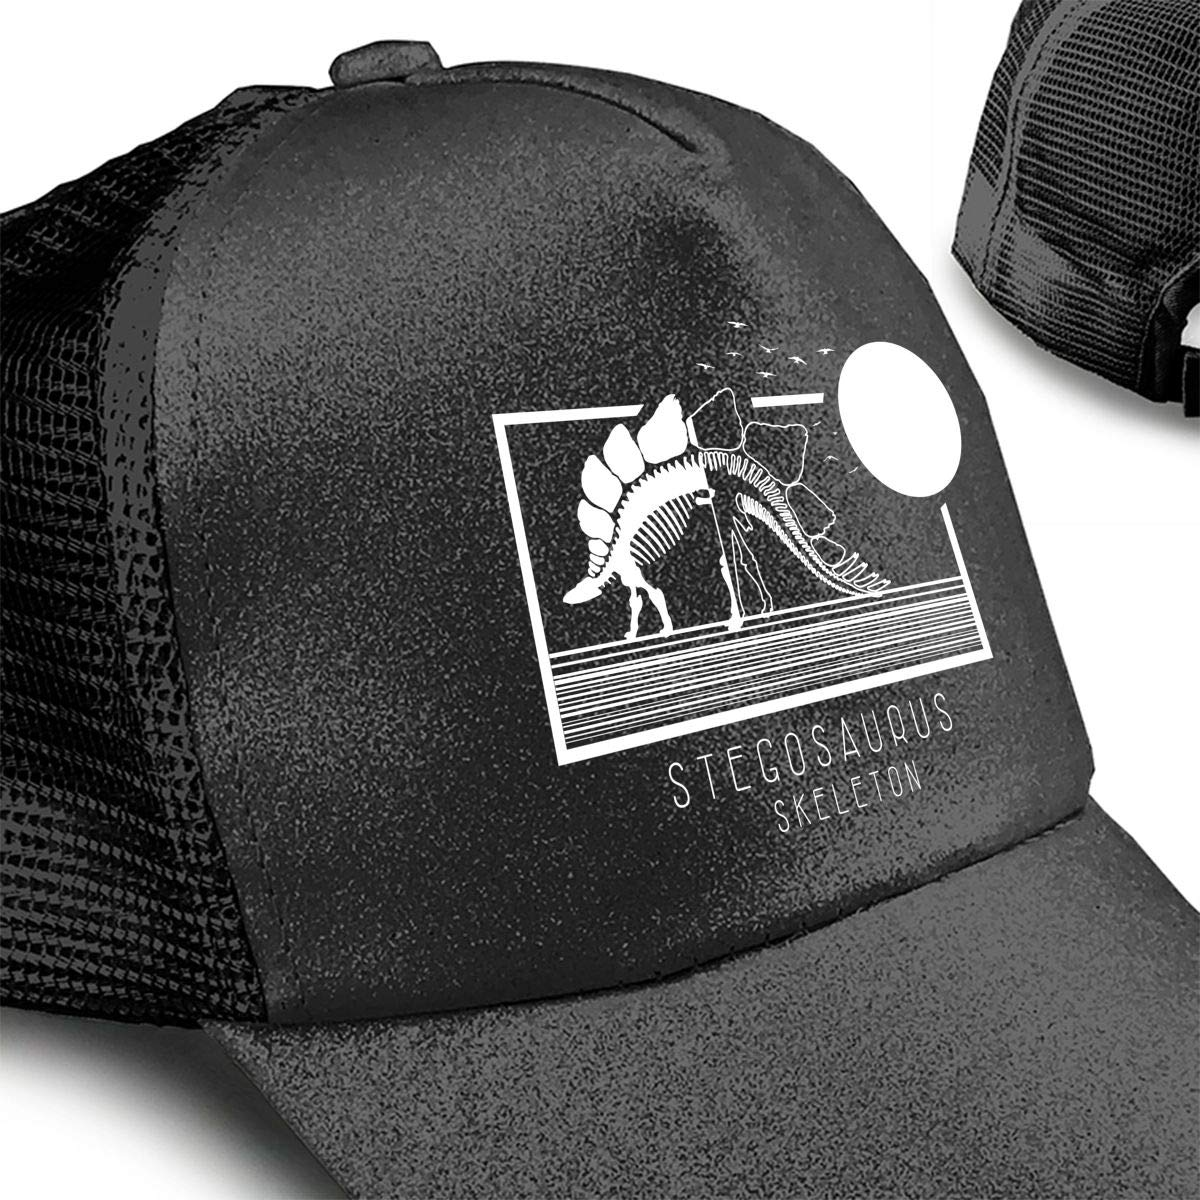 Stegosaurus Skeleton Illustration Ponytail Messy High Bun Hat Ponycaps Baseball Cap Adjustable Trucker Cap Mesh Cap